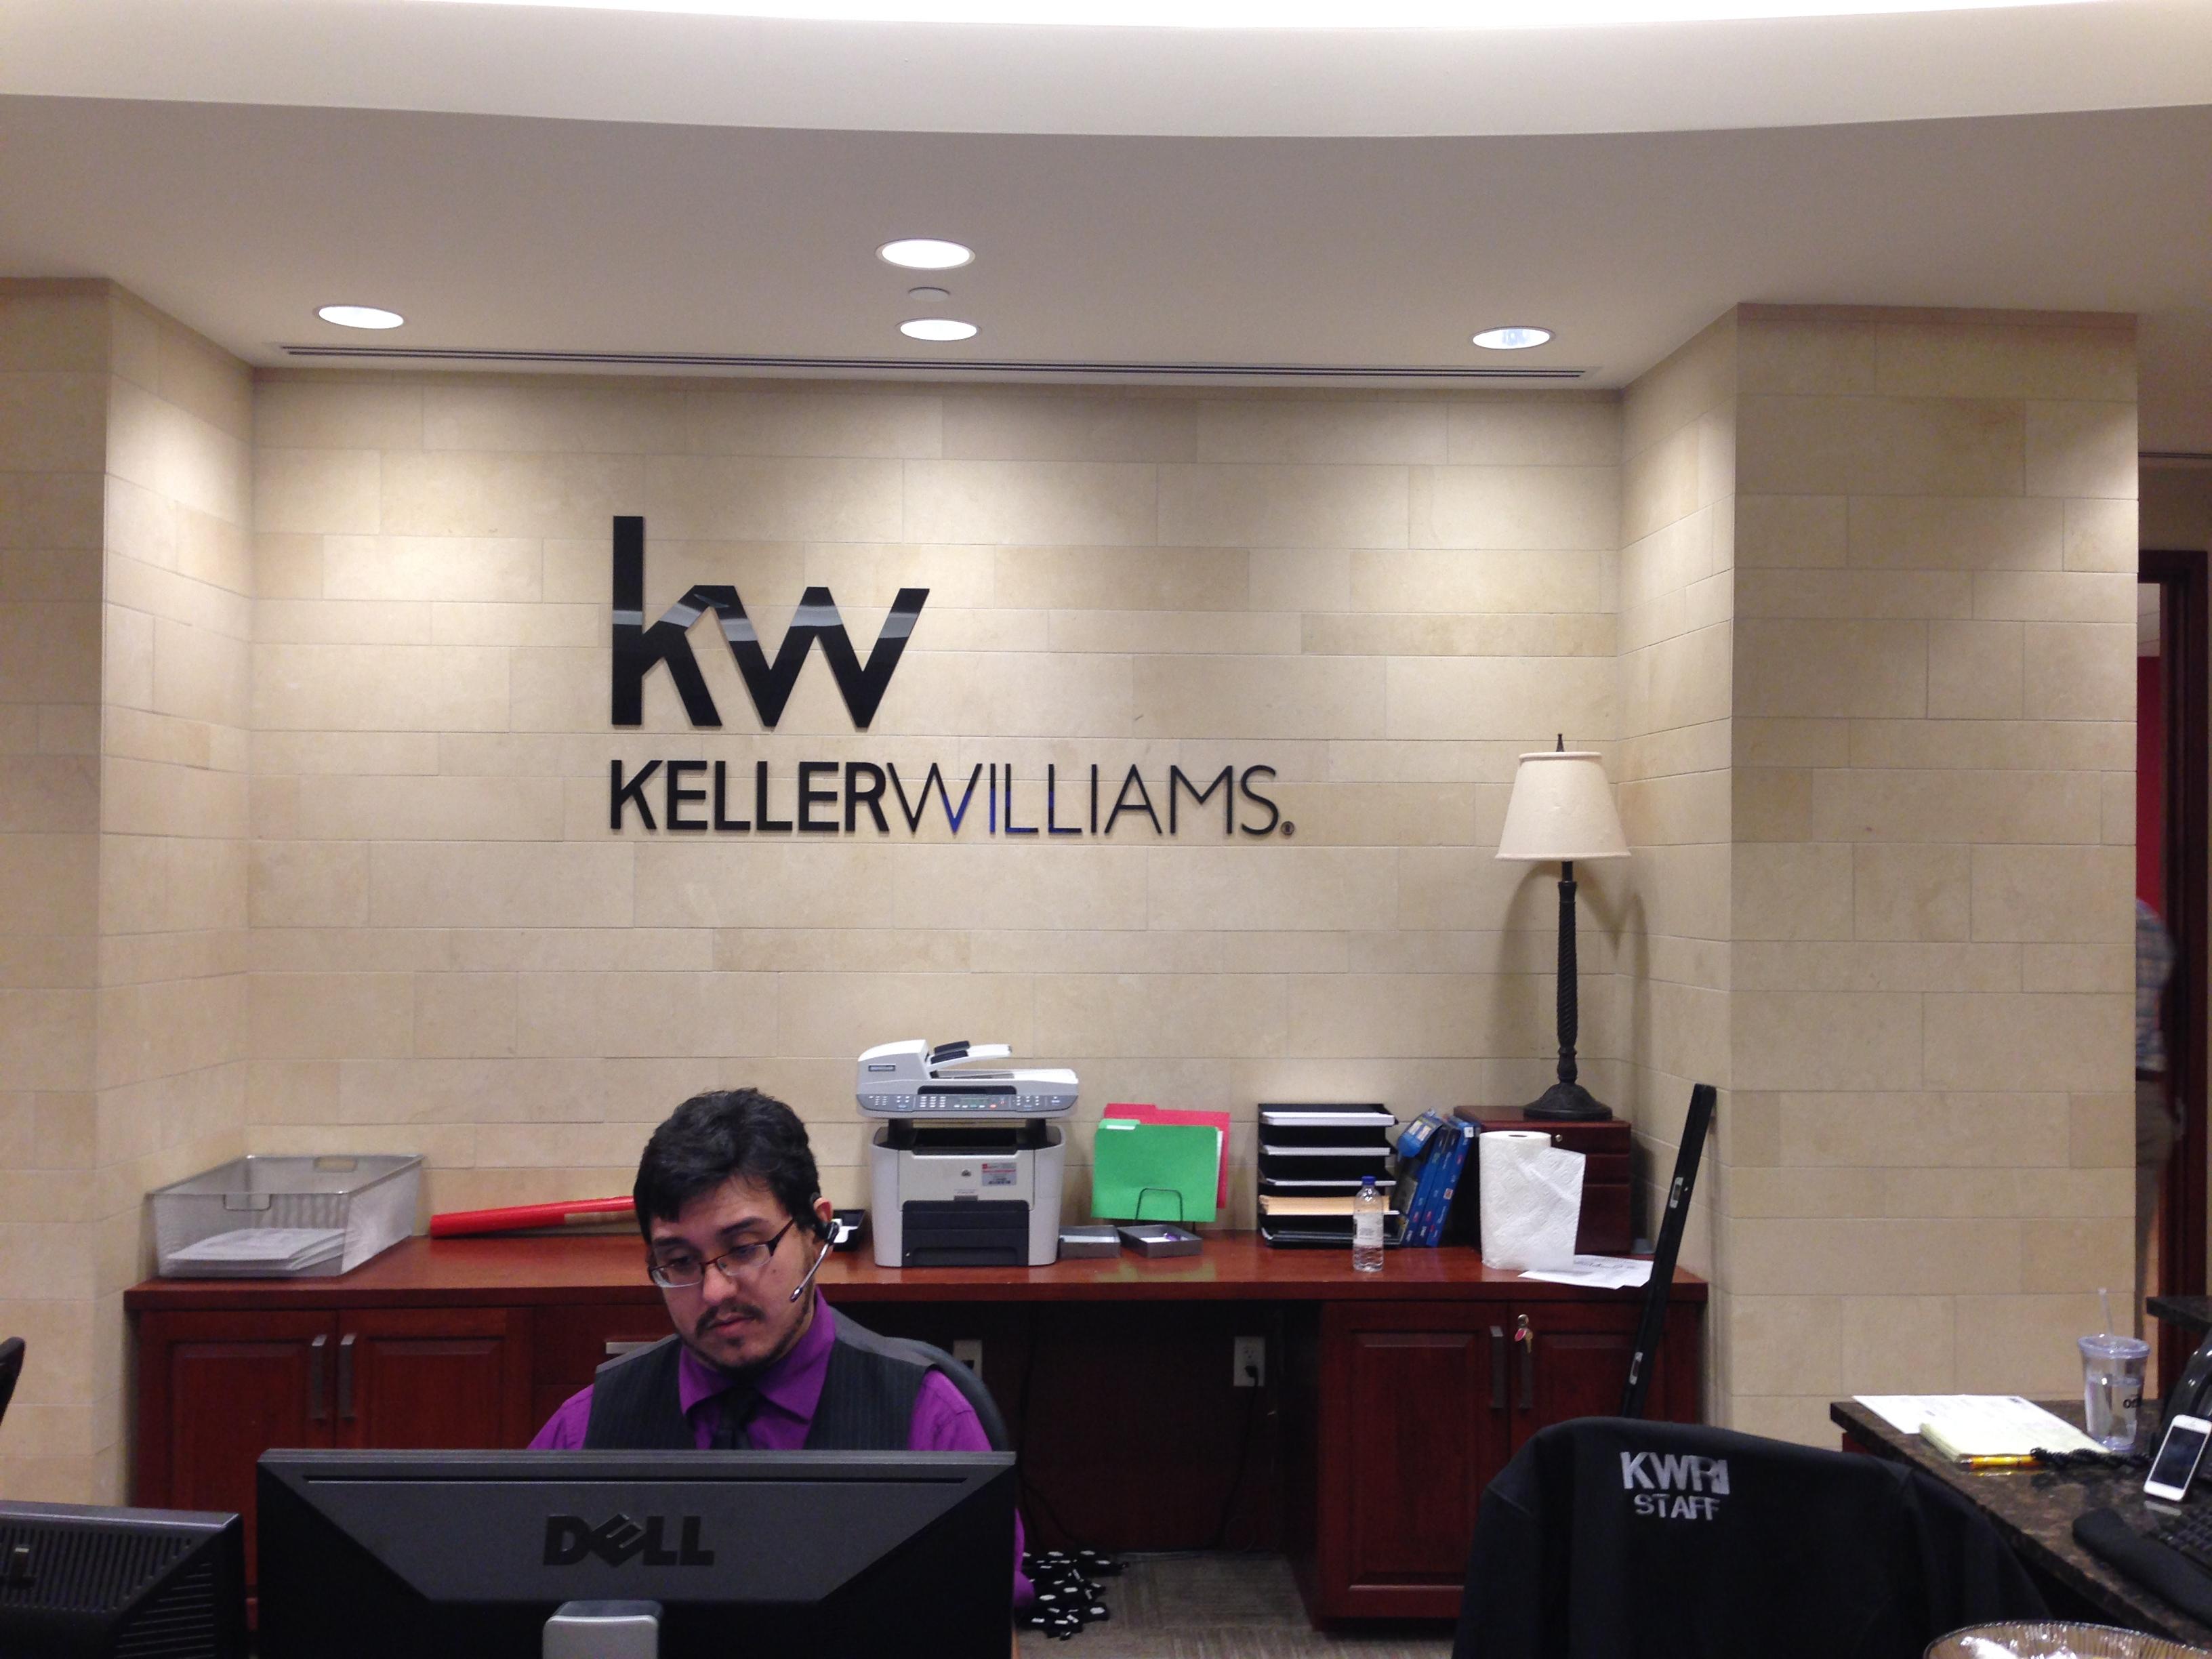 Keller Williams - Dimensional Interior Sign - lk34557(3).jpg